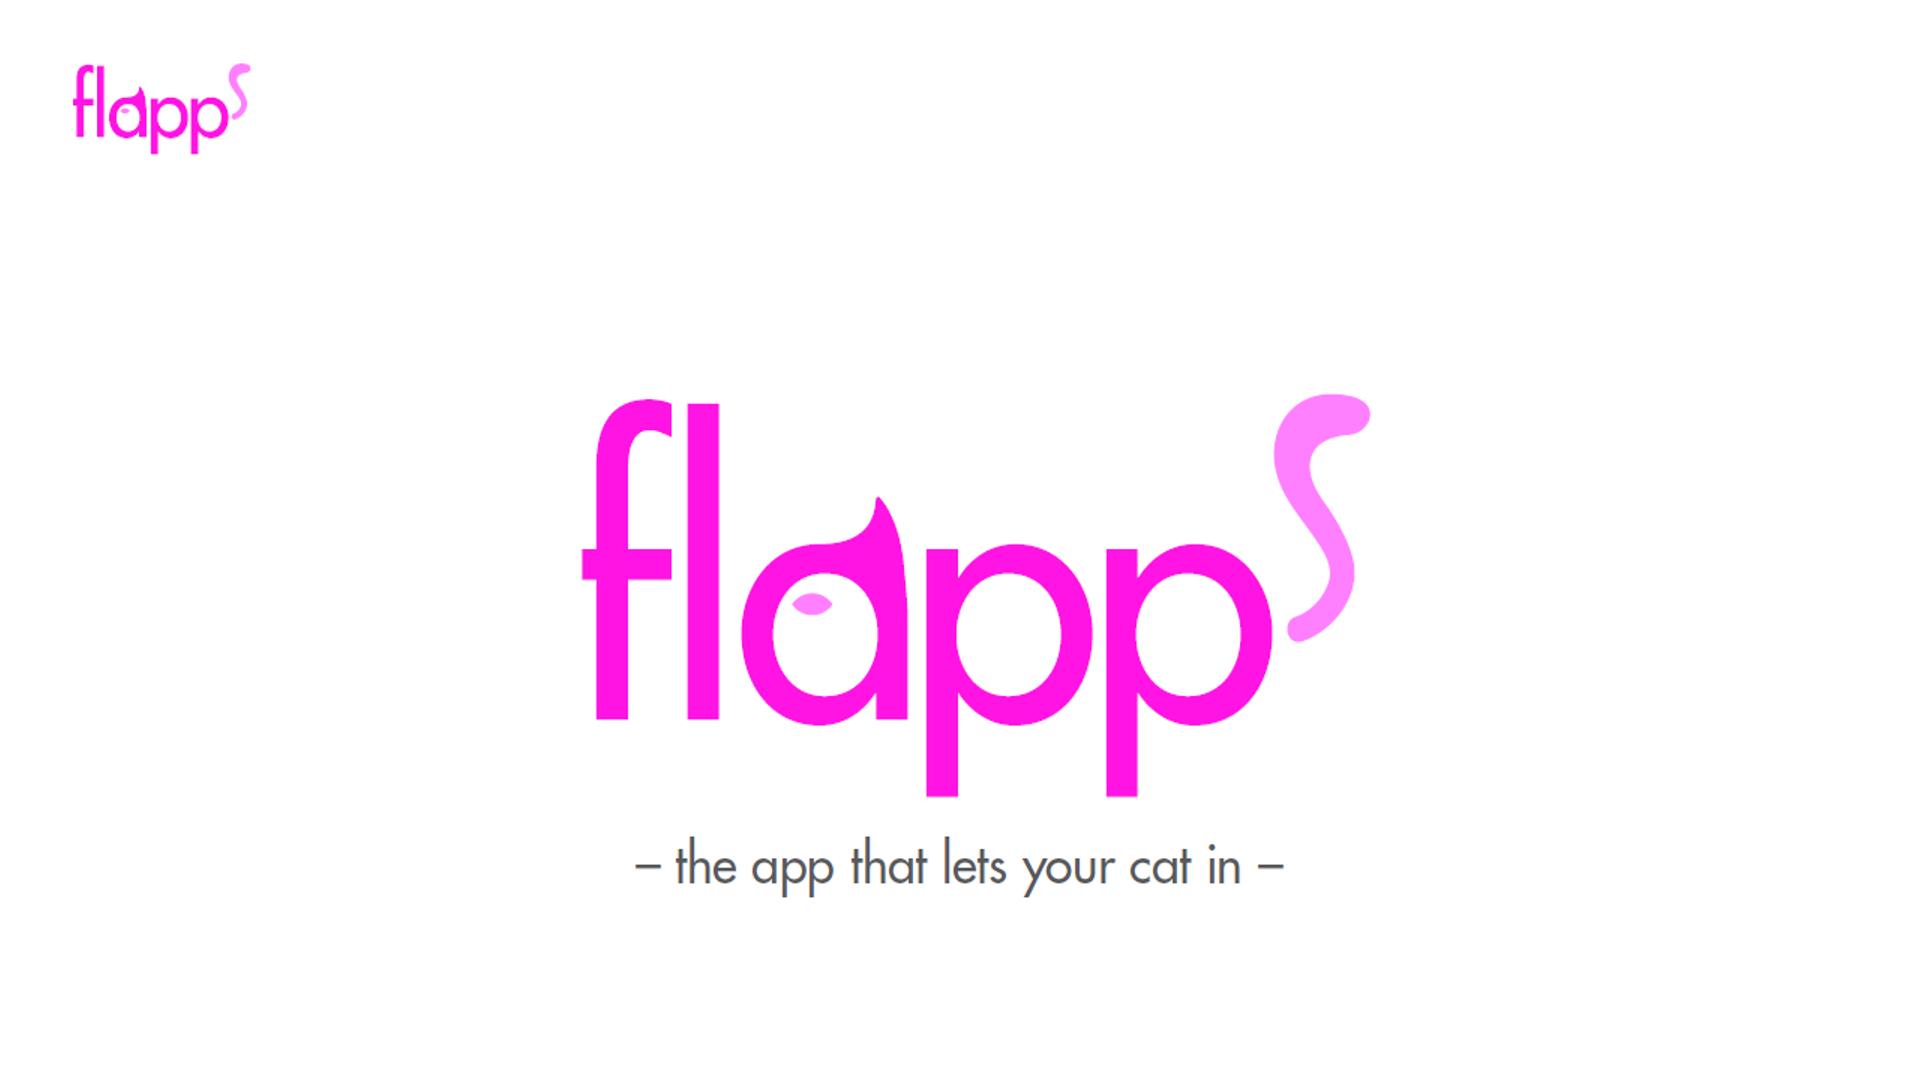 Hackathon Stuttgart 2015 flapp